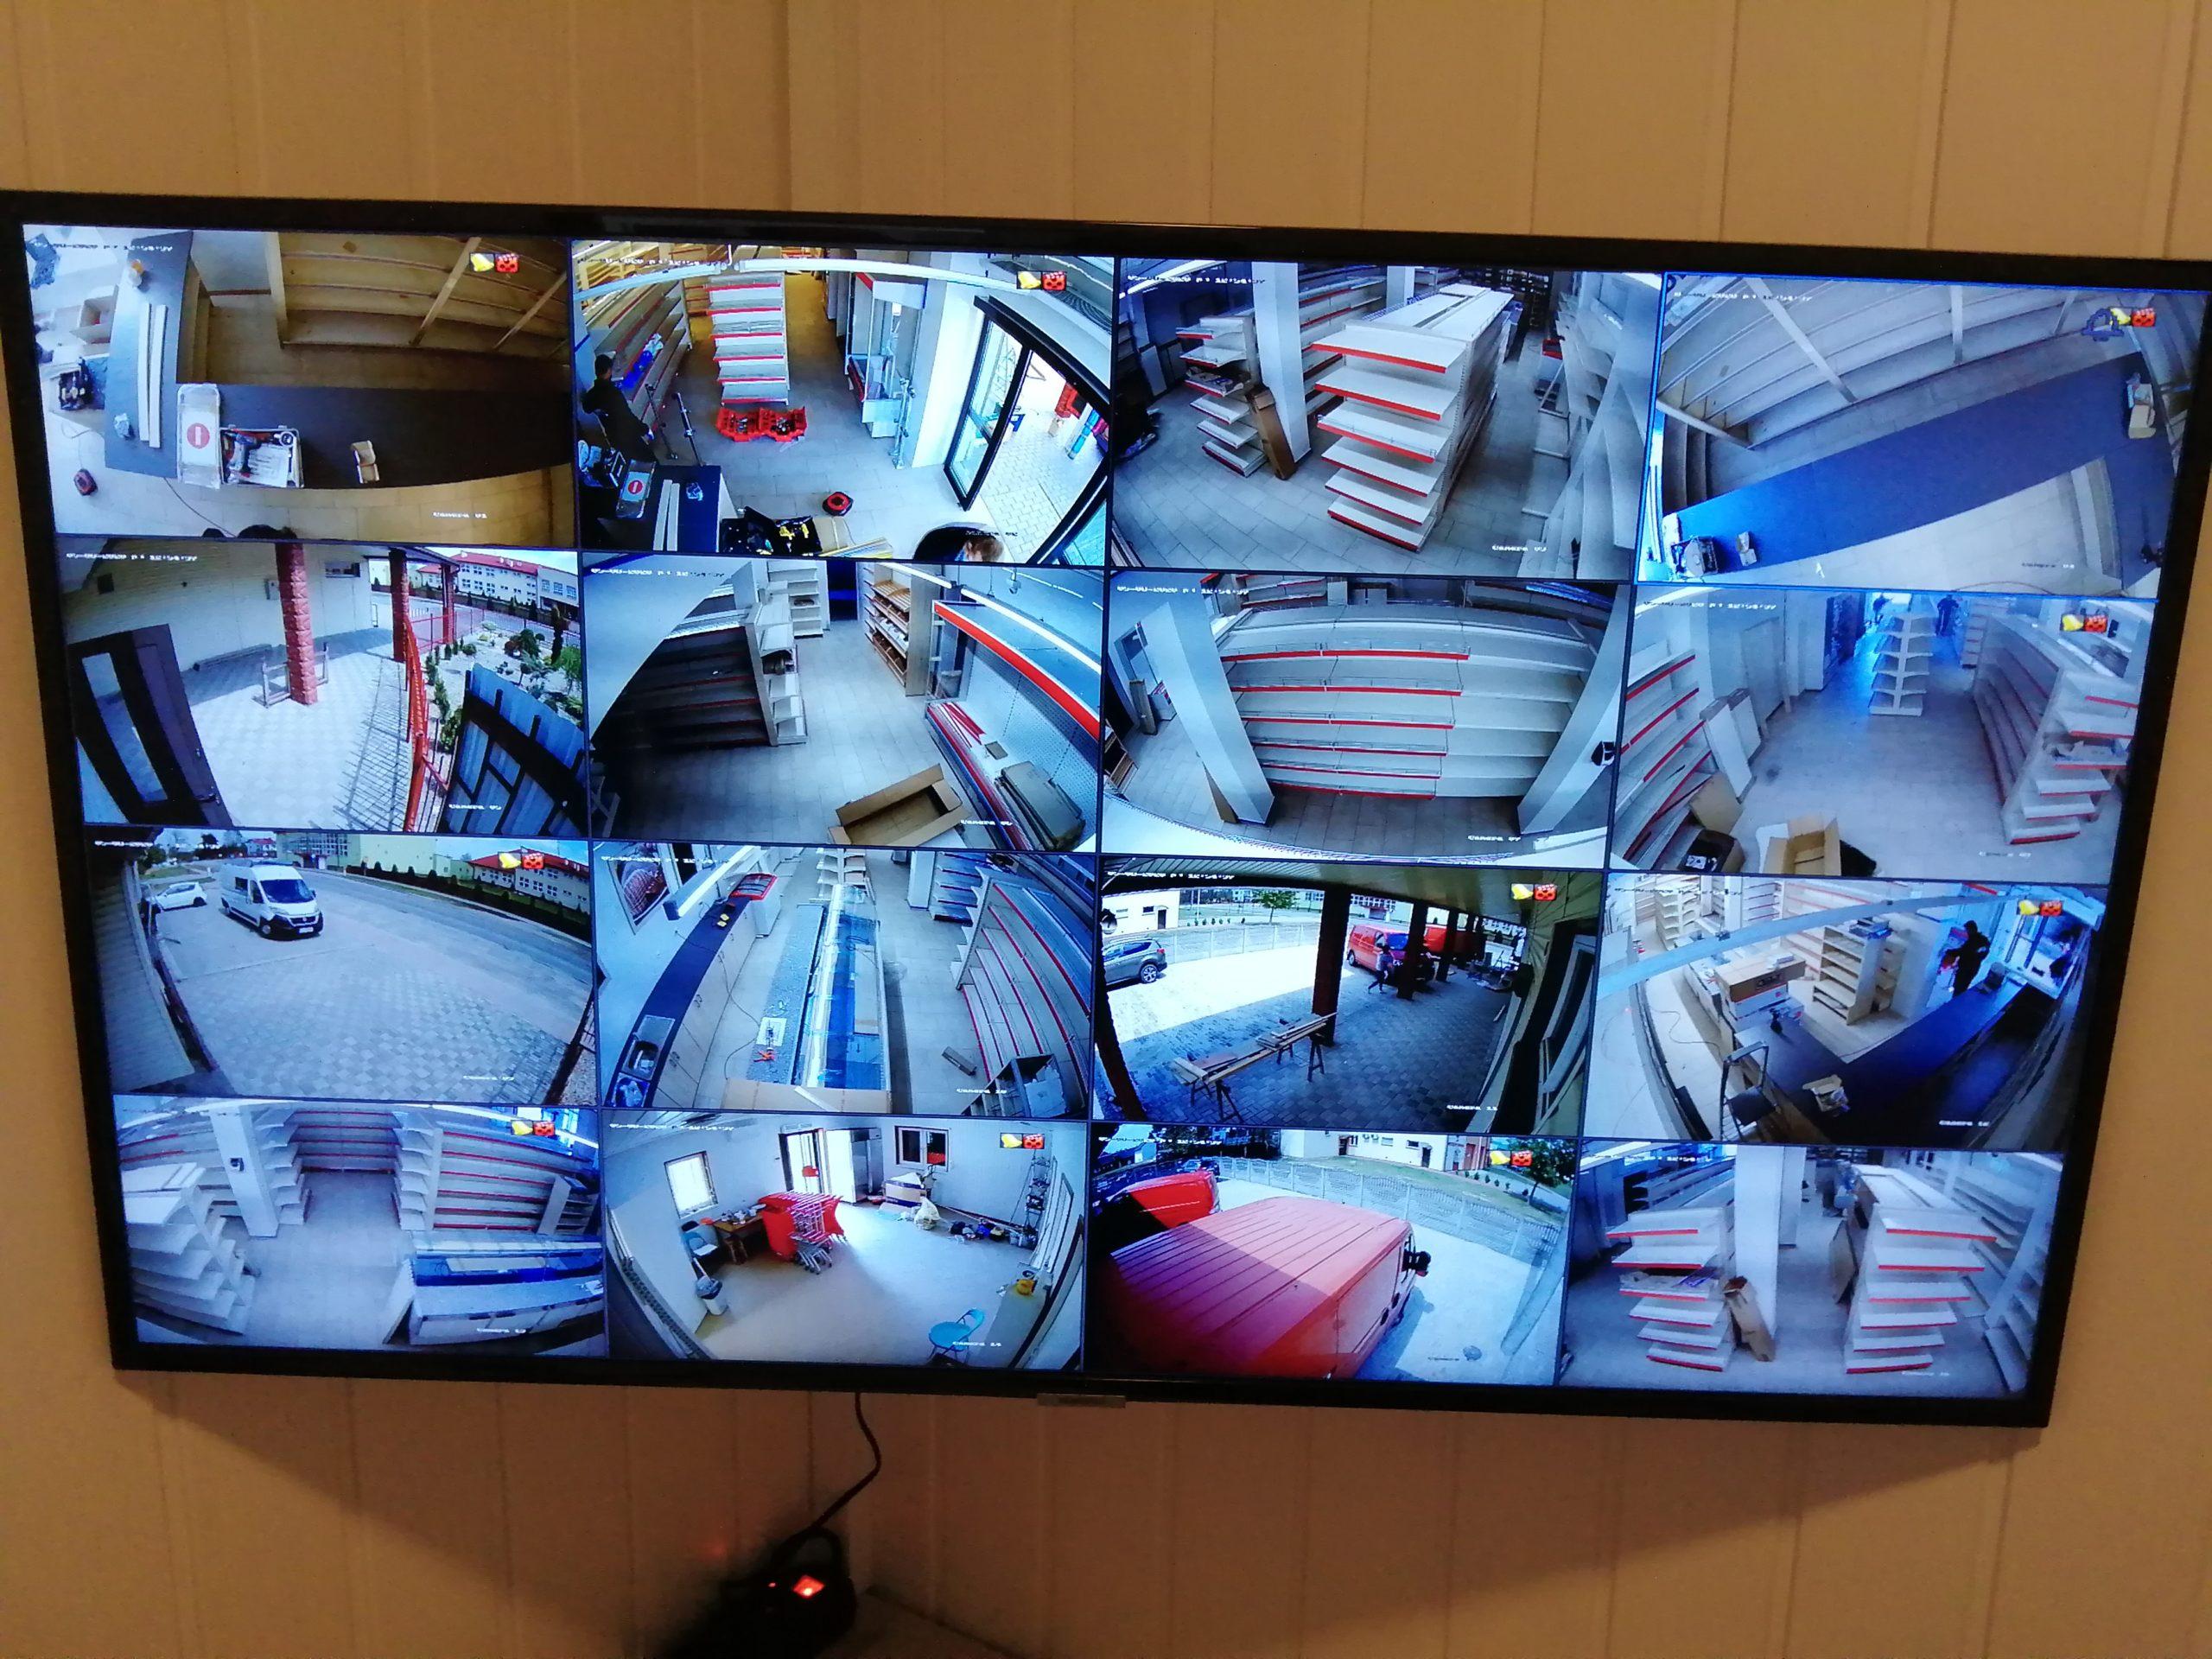 monitoring stalowa wola klimatyzacja stalowa wola fotowoltaika stalowa wola usługi informatyczne stalowa wola 3